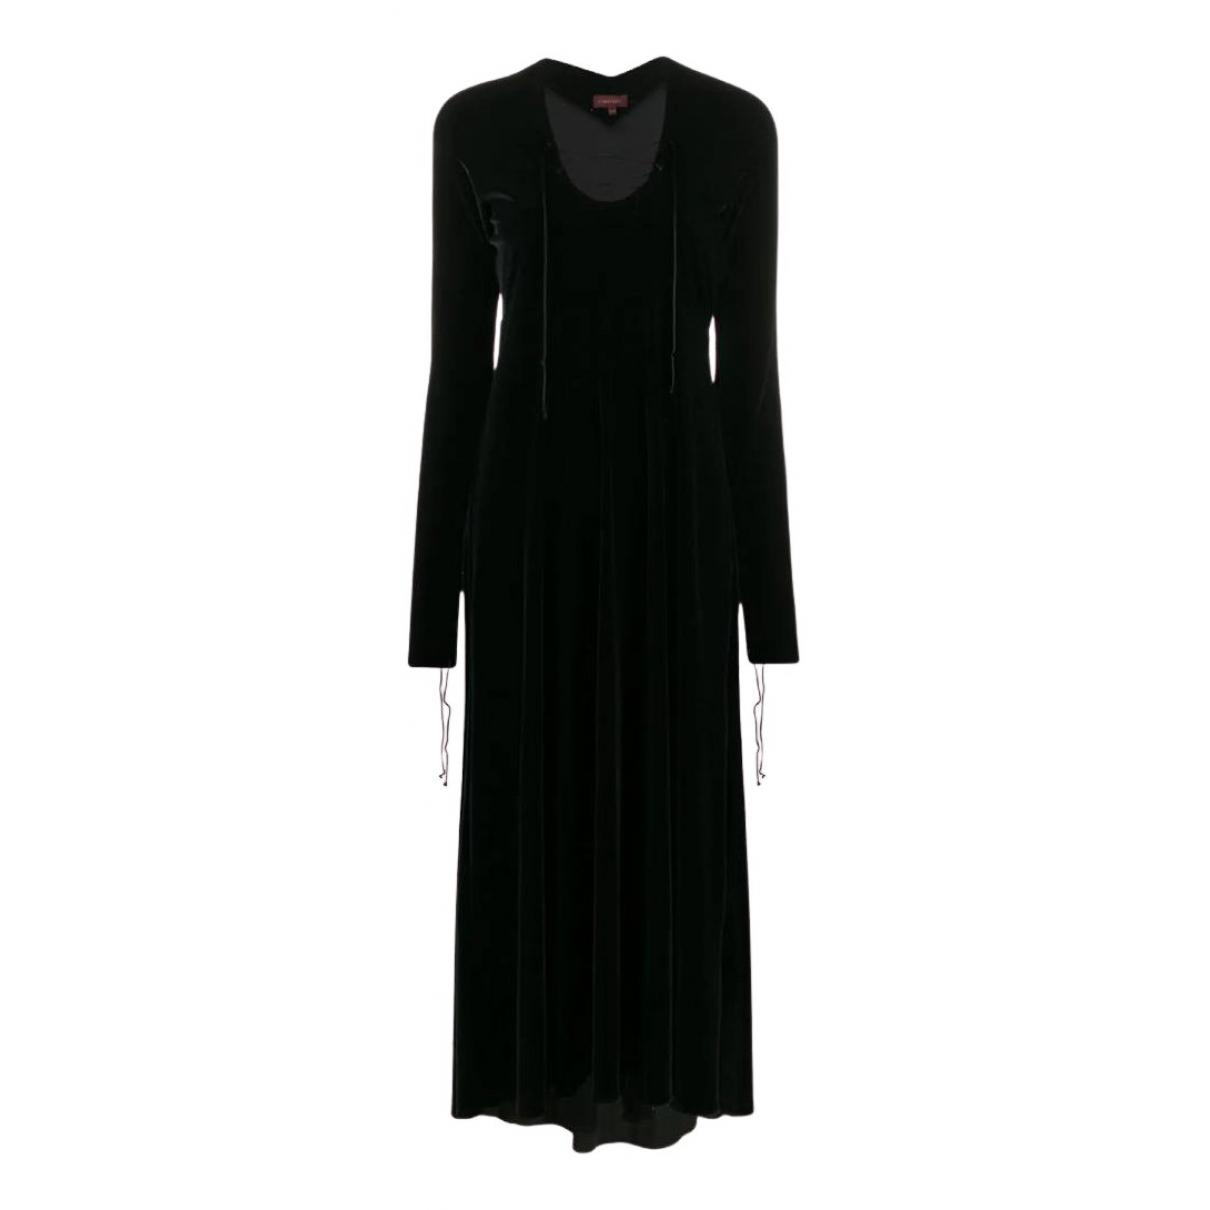 Romeo Gigli N Black dress for Women 44 IT